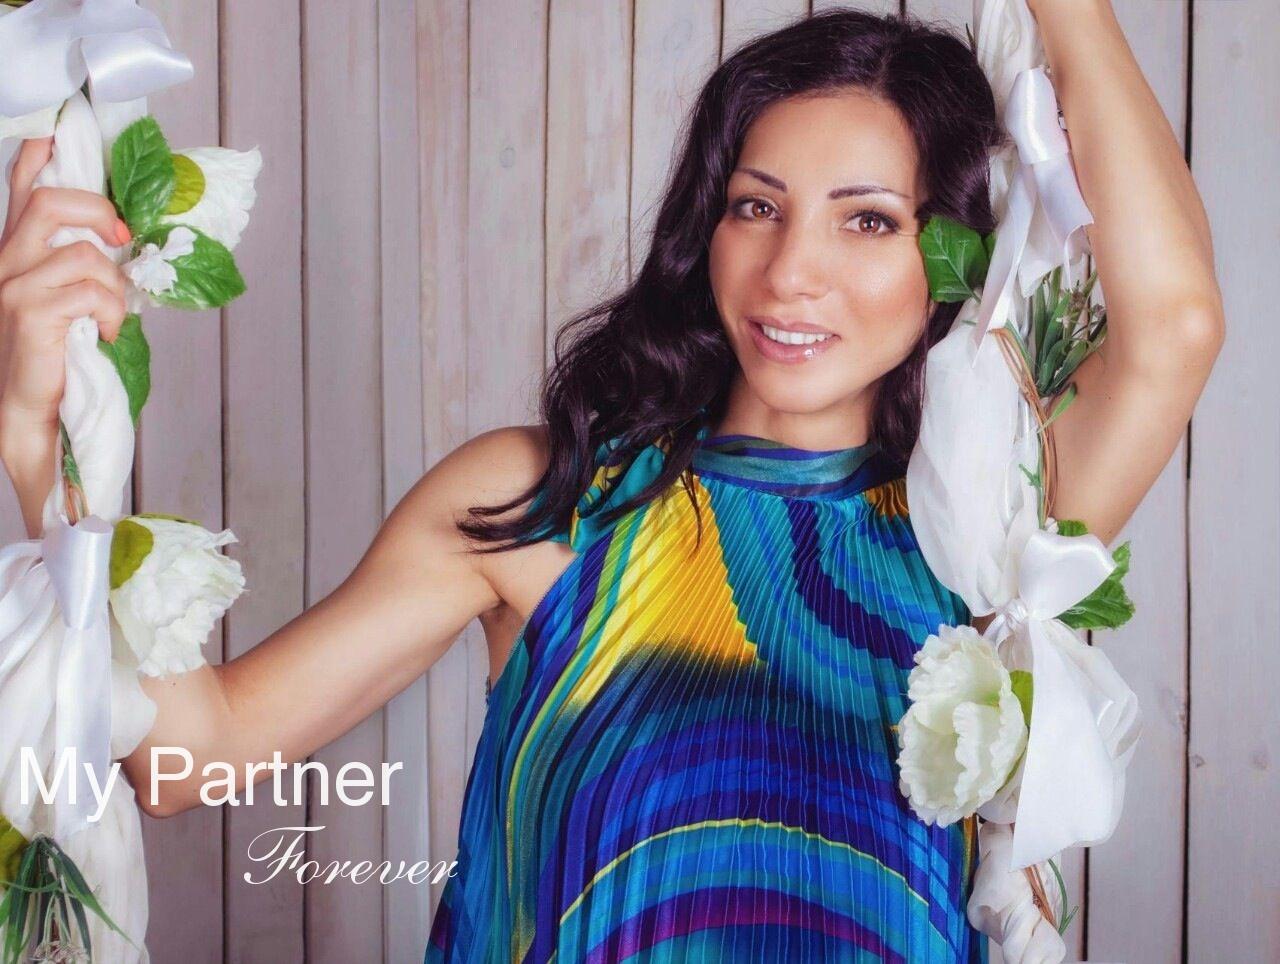 International Dating Service to Meet Arina from Kiev, Ukraine